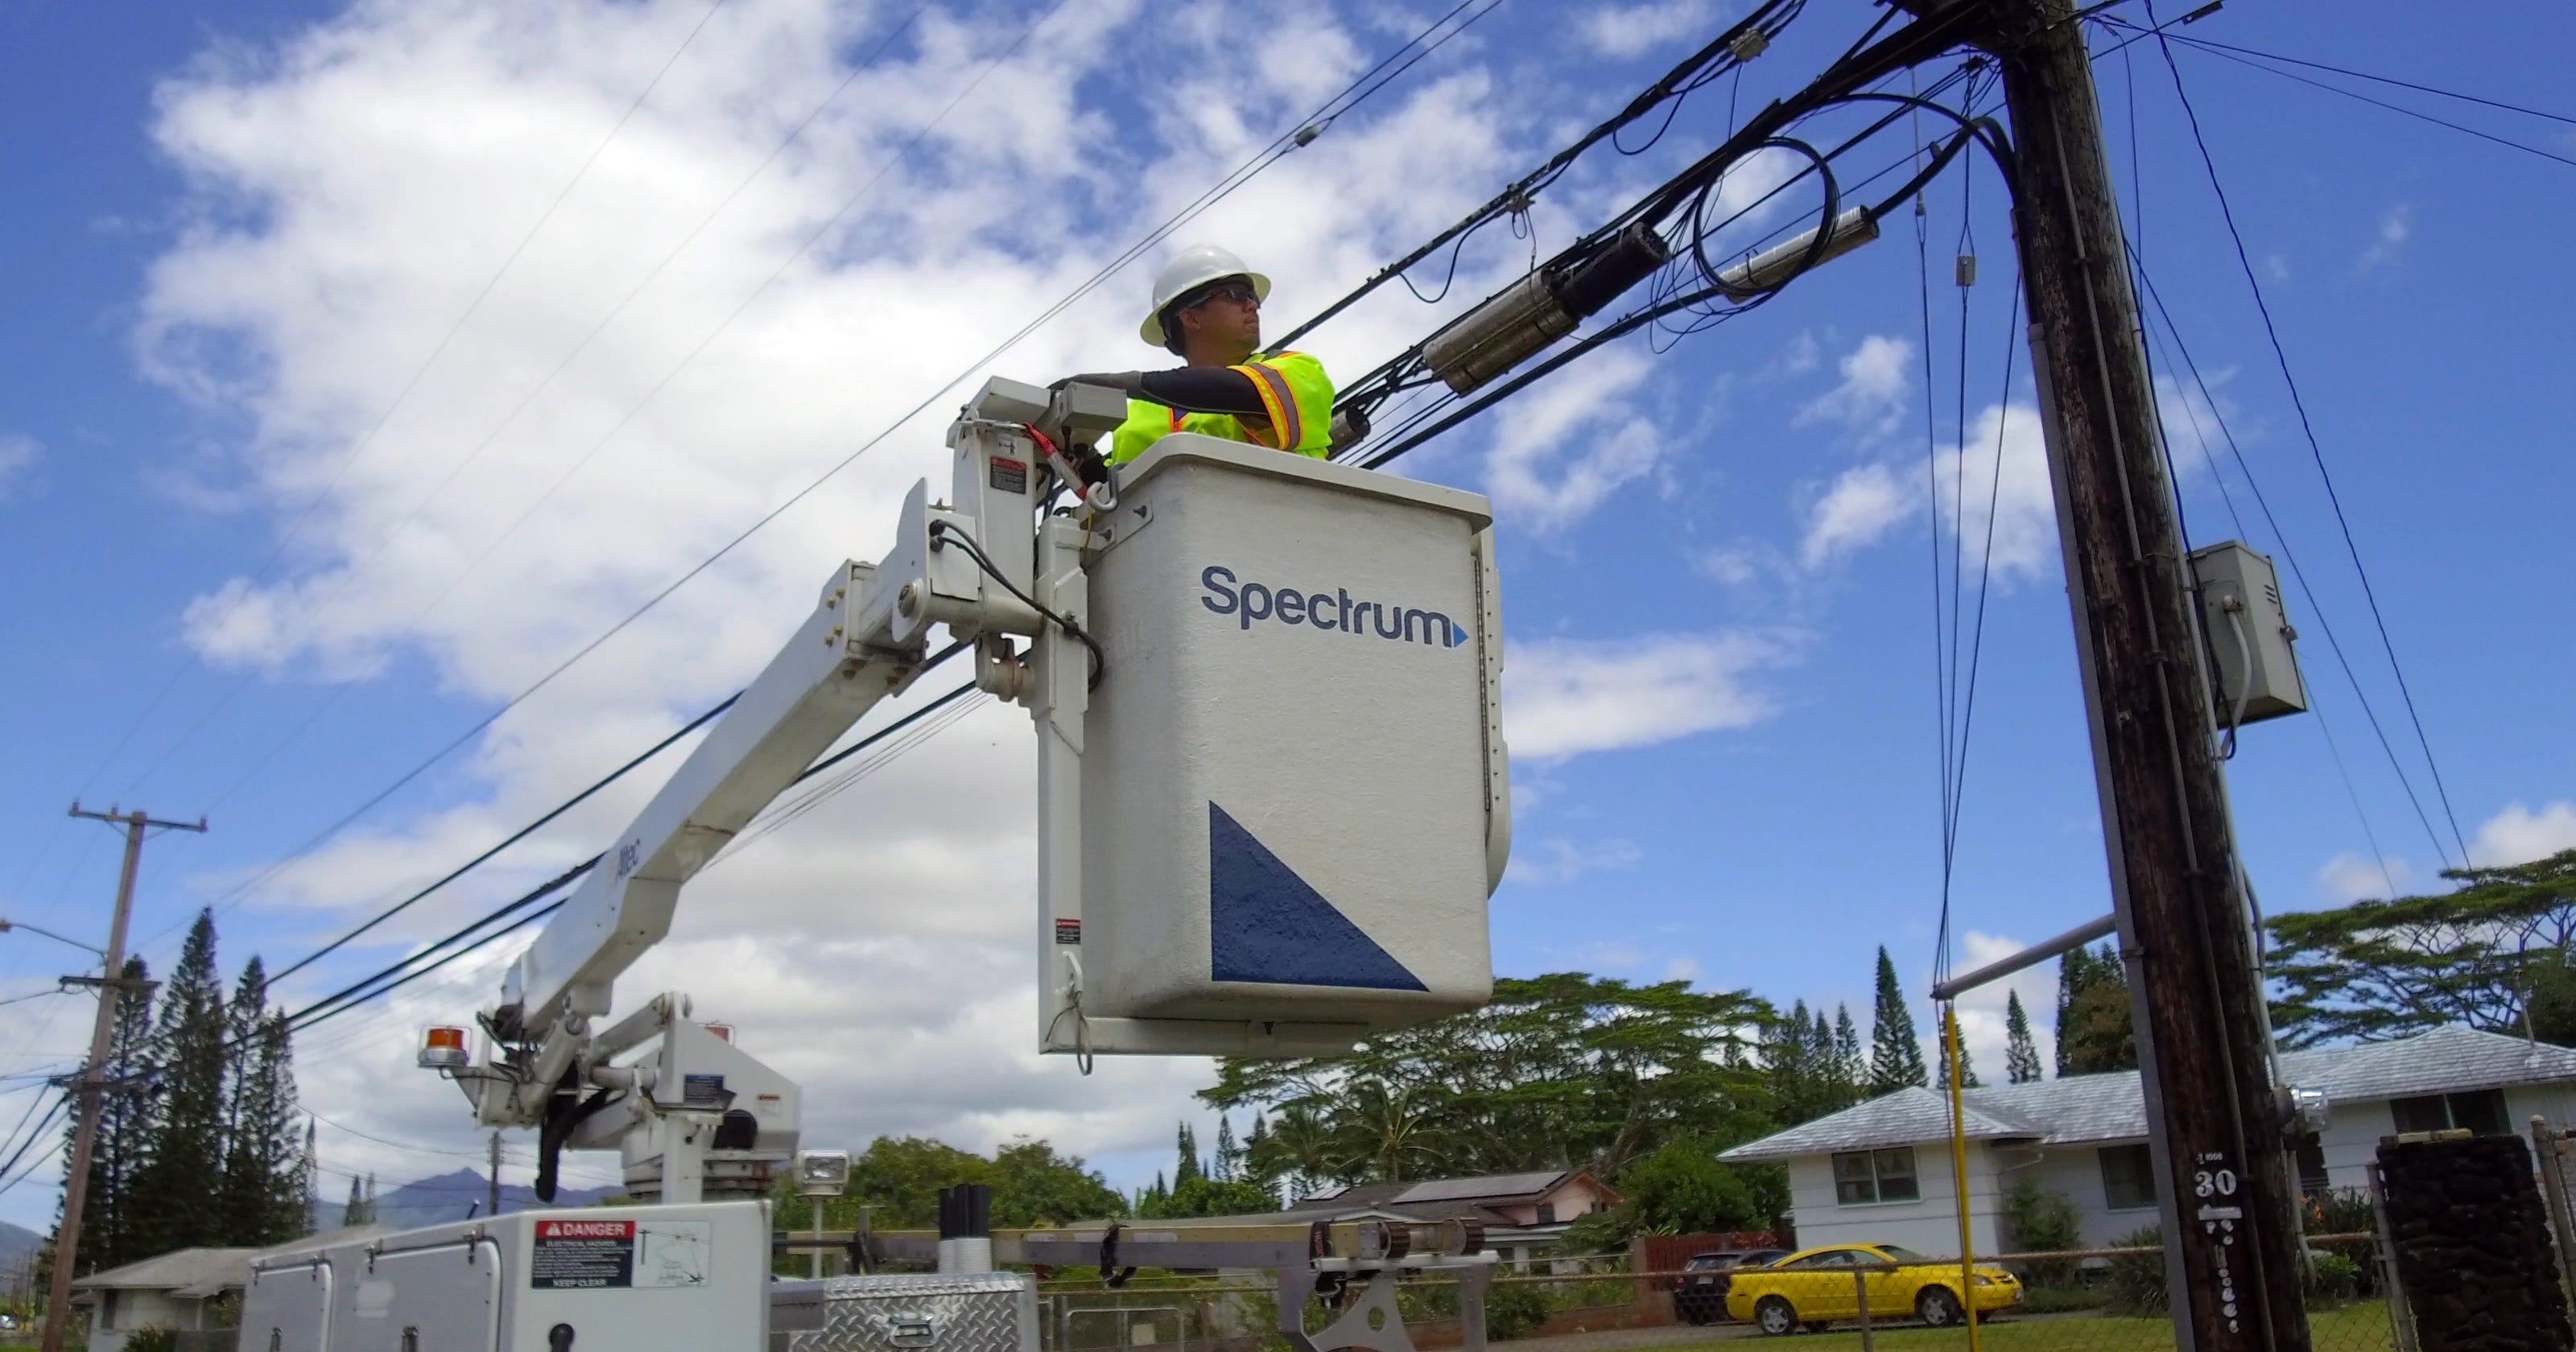 Spectrum ranked last in J D  Power satisfaction survey